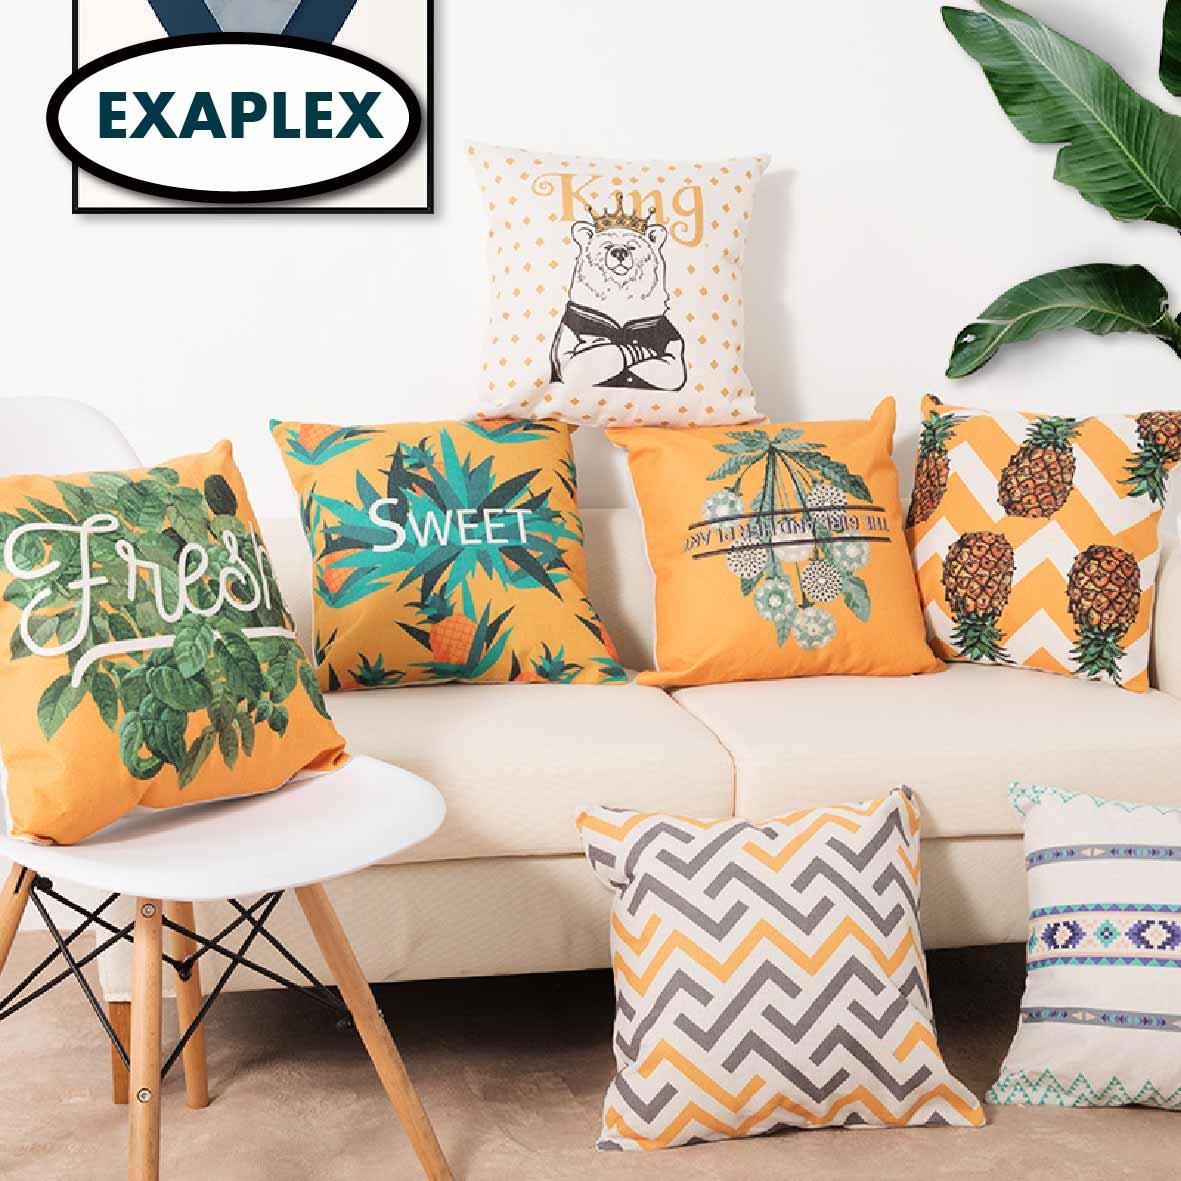 Cushion  45*45 50*50 55*55 Two Side Printed Soft Cotton Linen Blend Cartoon Stripes Tropical Plants European Style Pastora